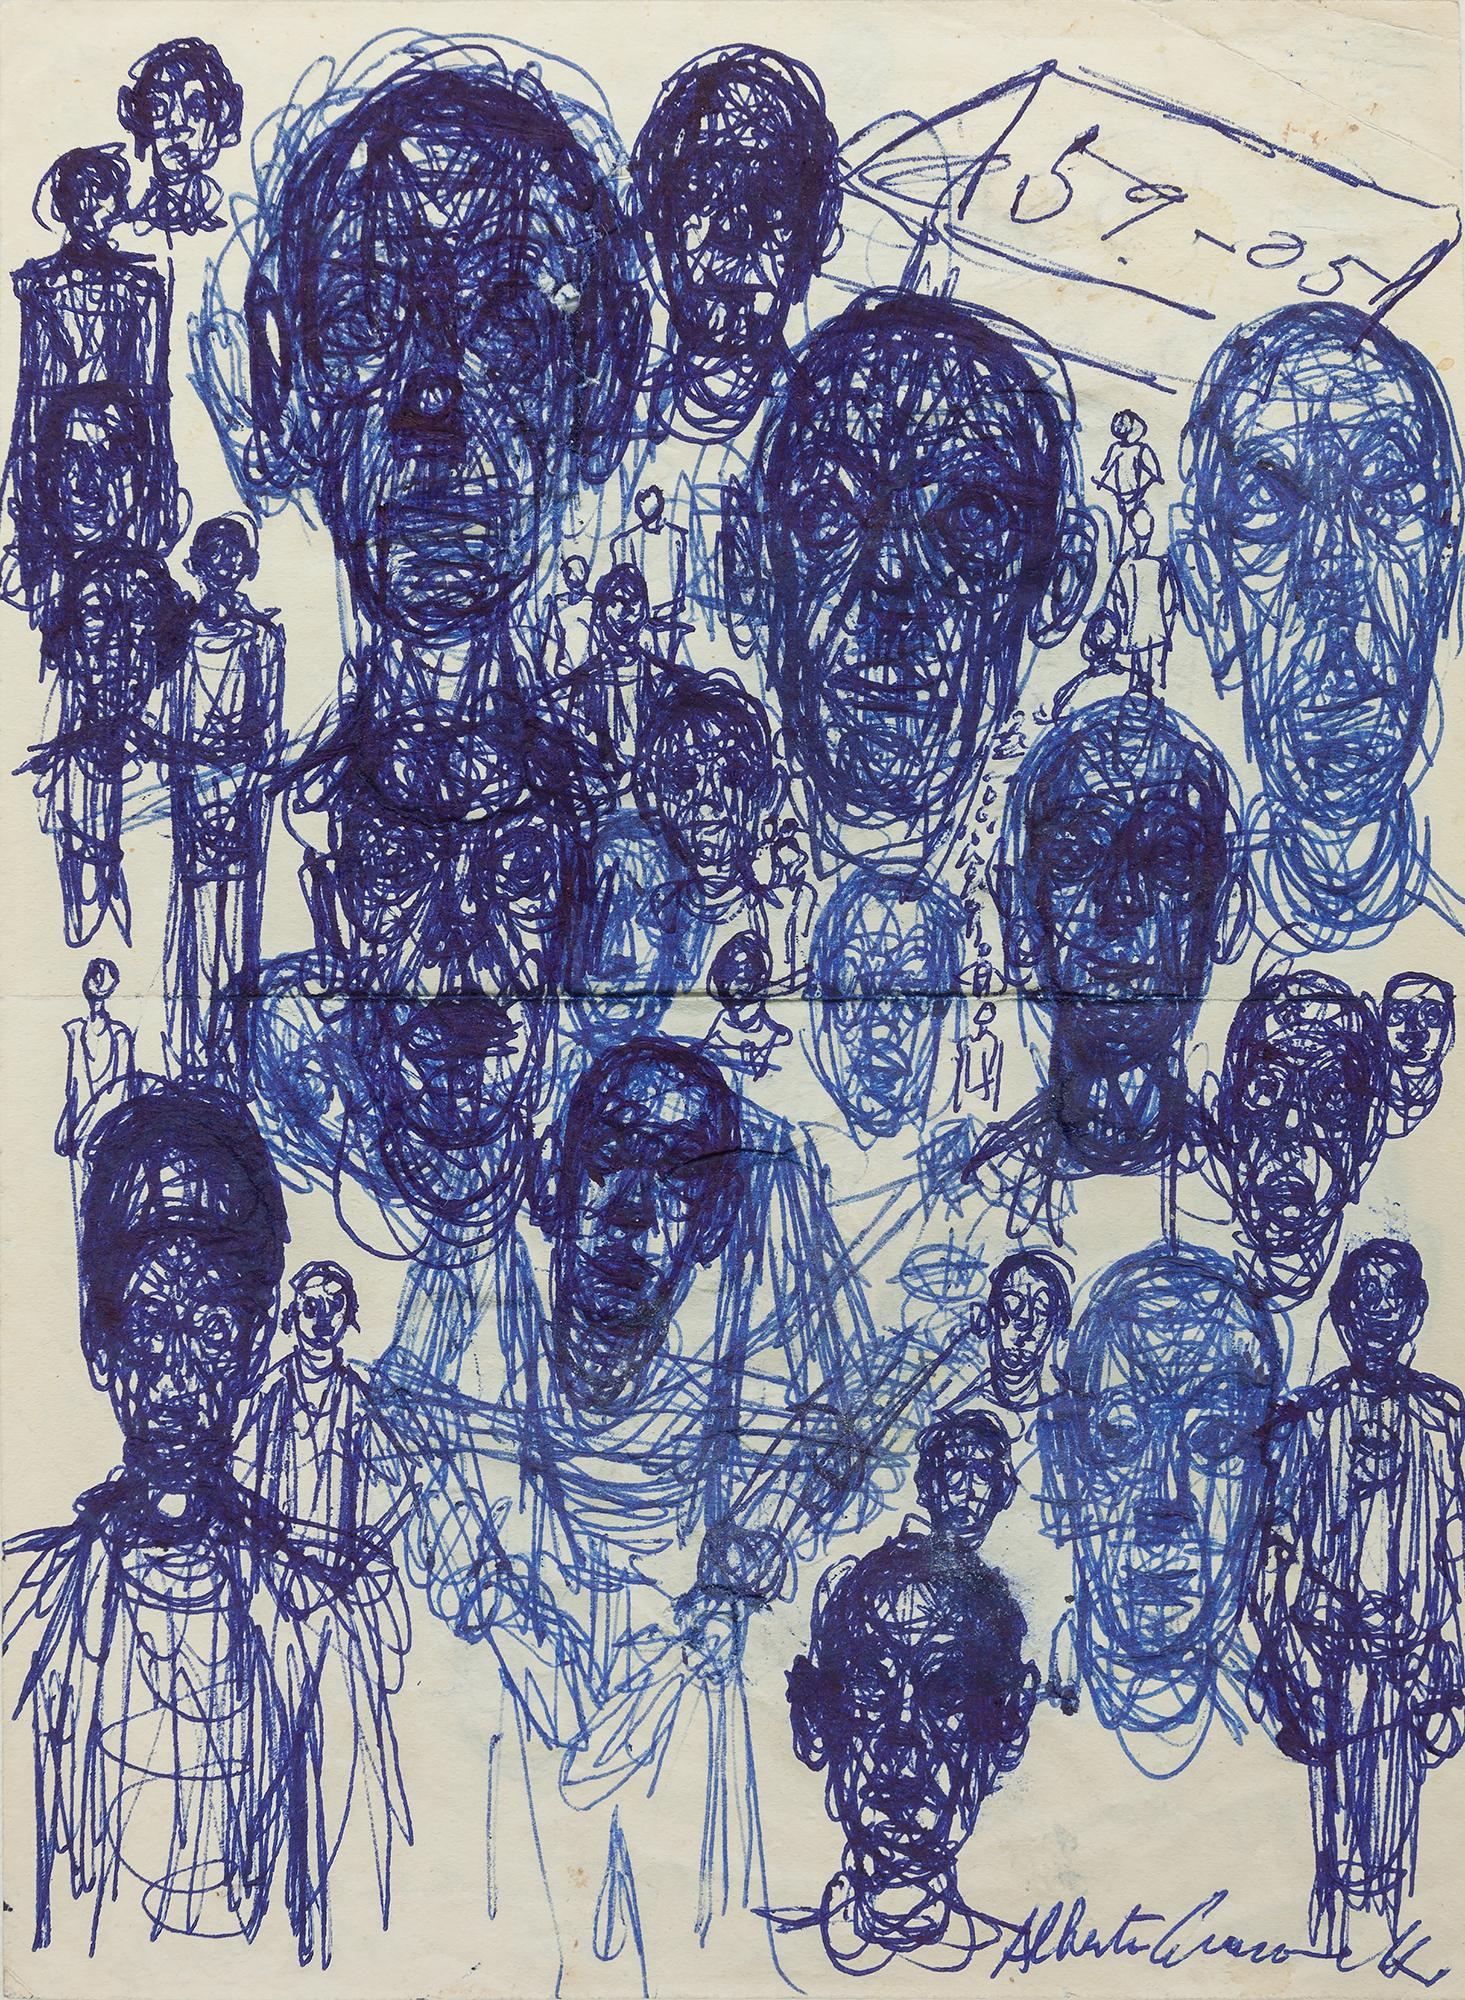 Men's Heads  ( Têtes d'hommes ), ca. 1959 Ballpoint pen on paper 18.3 x 13.6 cm Fondation Giacometti, Paris © Succession Alberto Giacometti, VEGAP, Bilbao, 2018